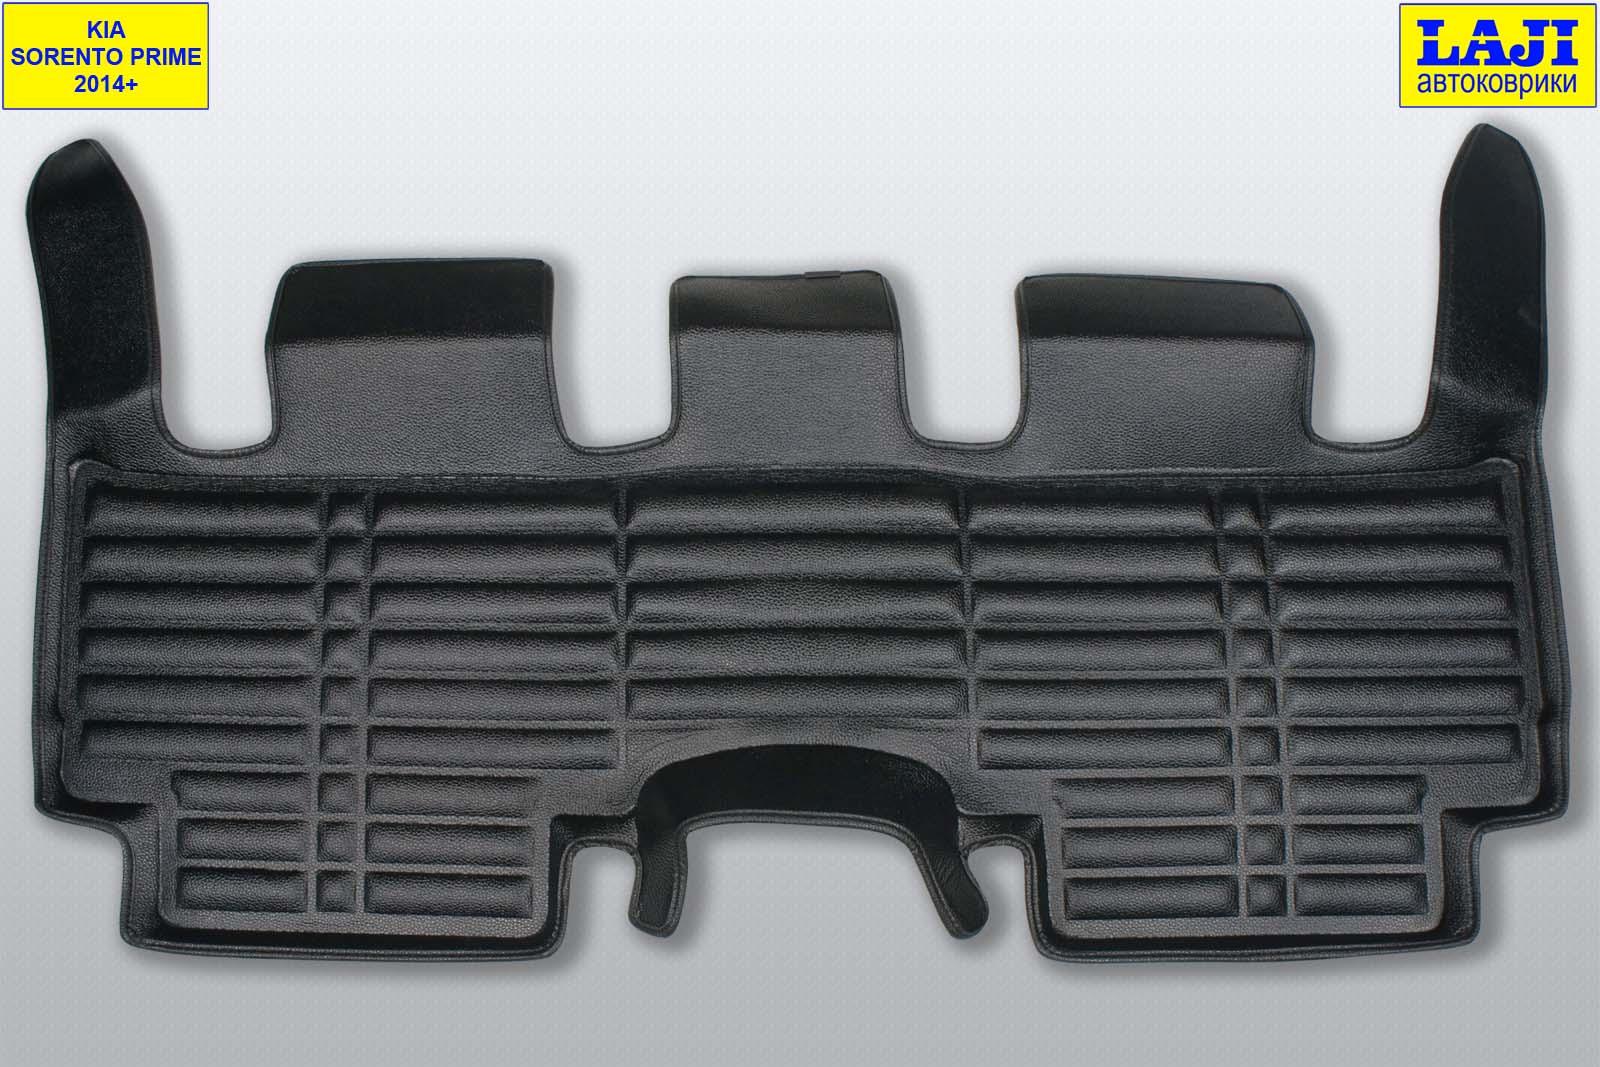 5D коврики в салон KIA Sorento Prime UM 2014-2020 9